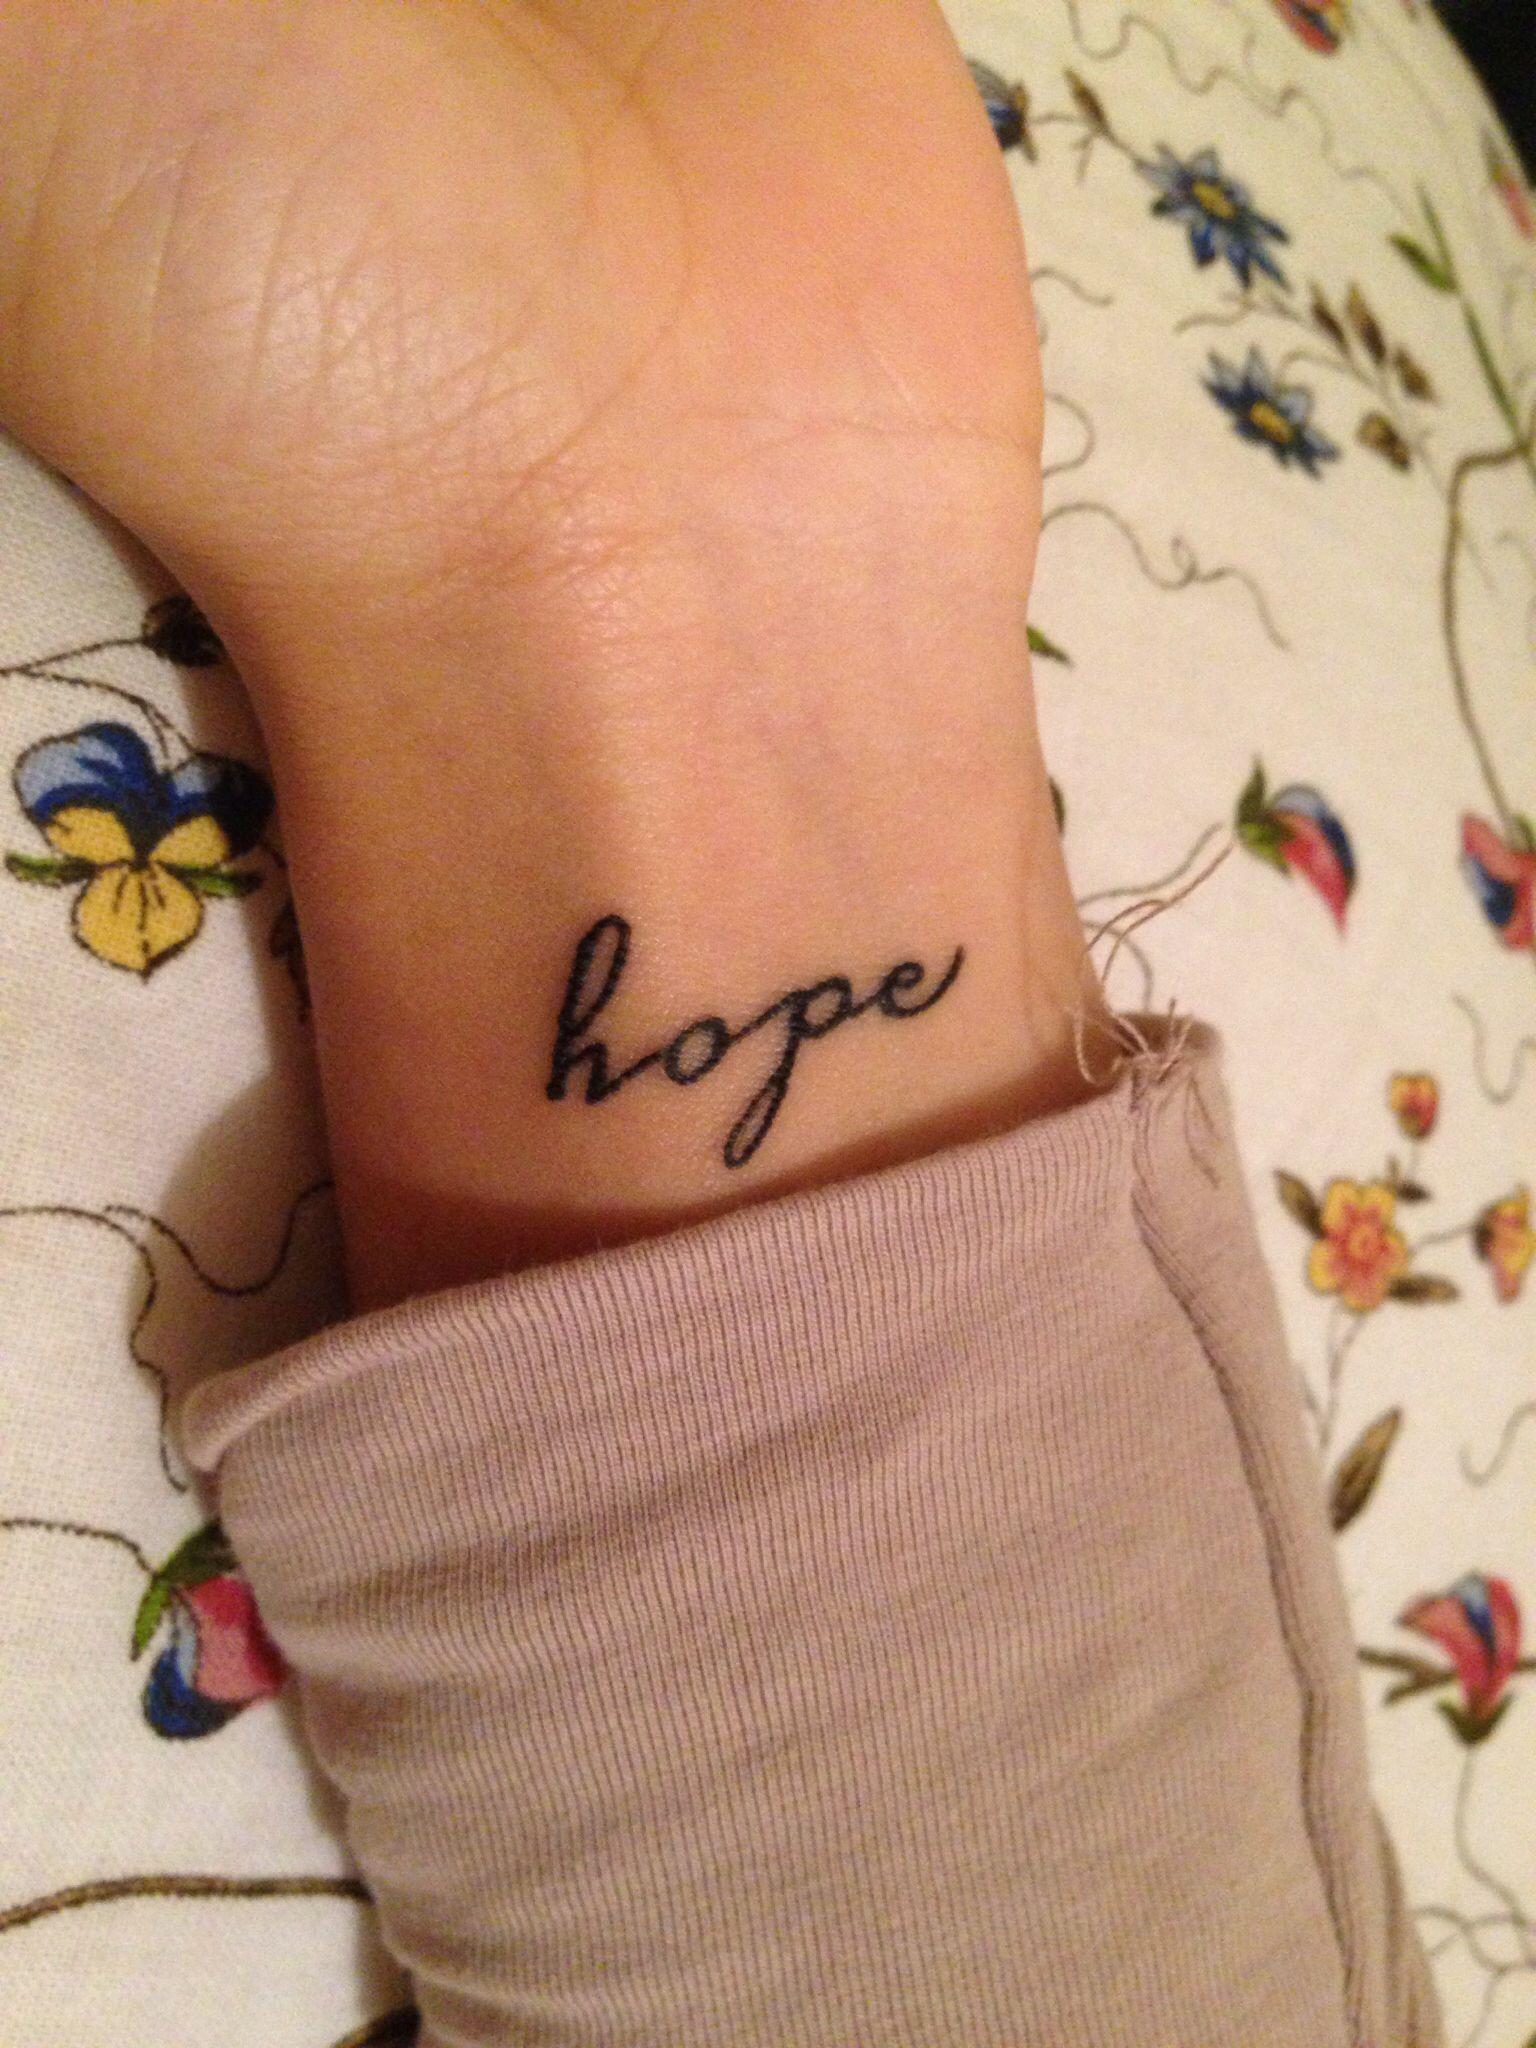 Hope Tattoo Wrist Tattoos Pinterest Tattoos Wrist Tattoos And